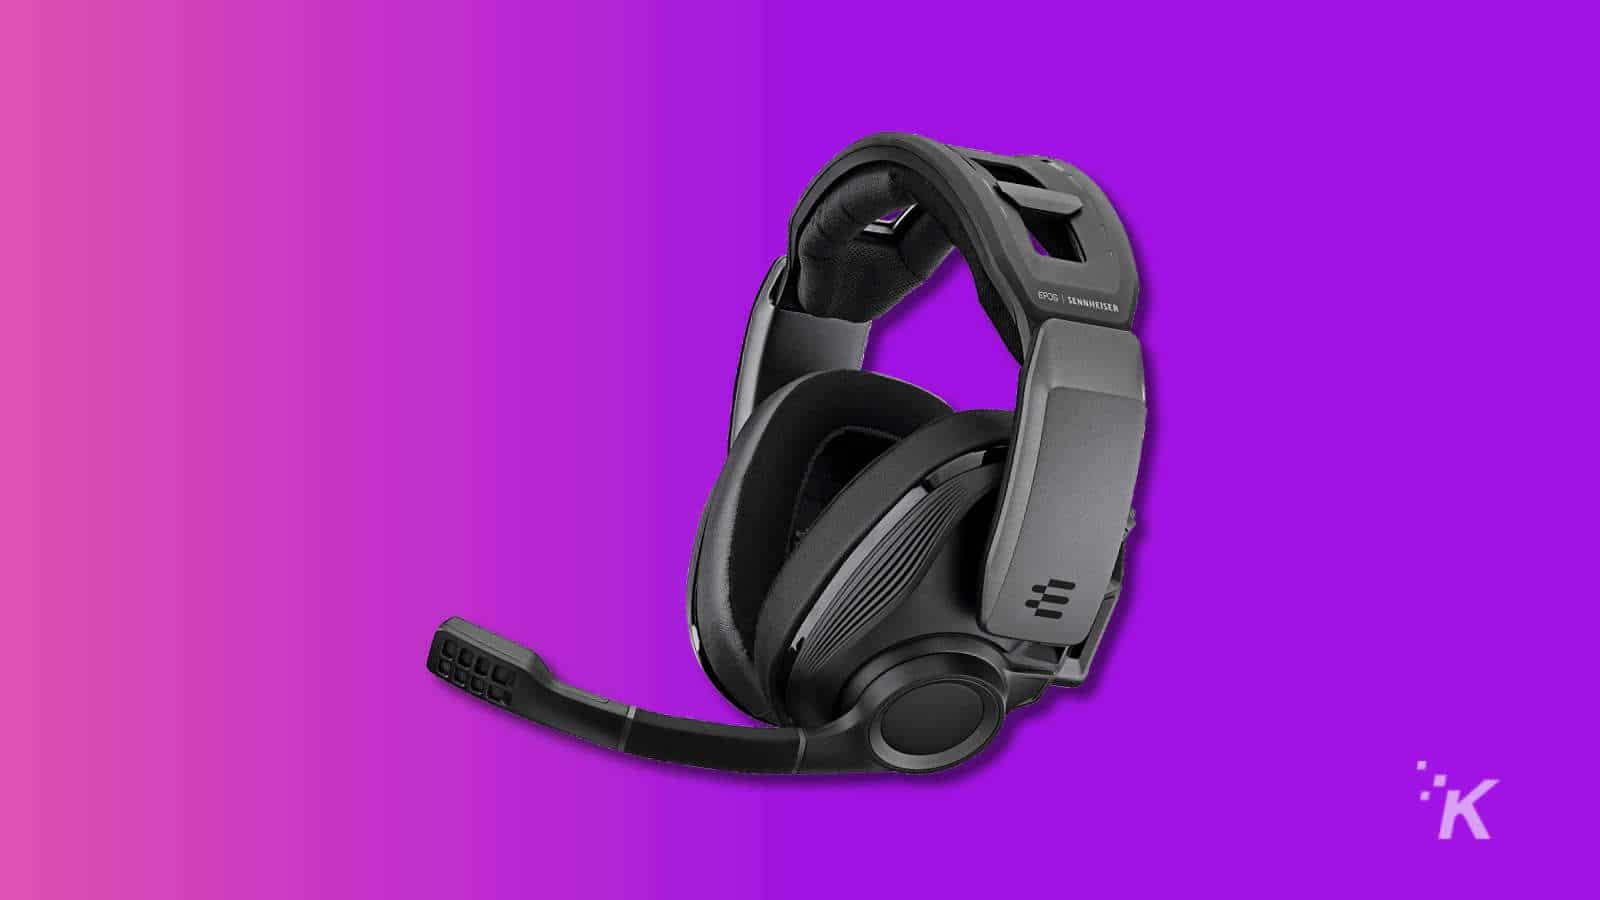 gsp670 headset